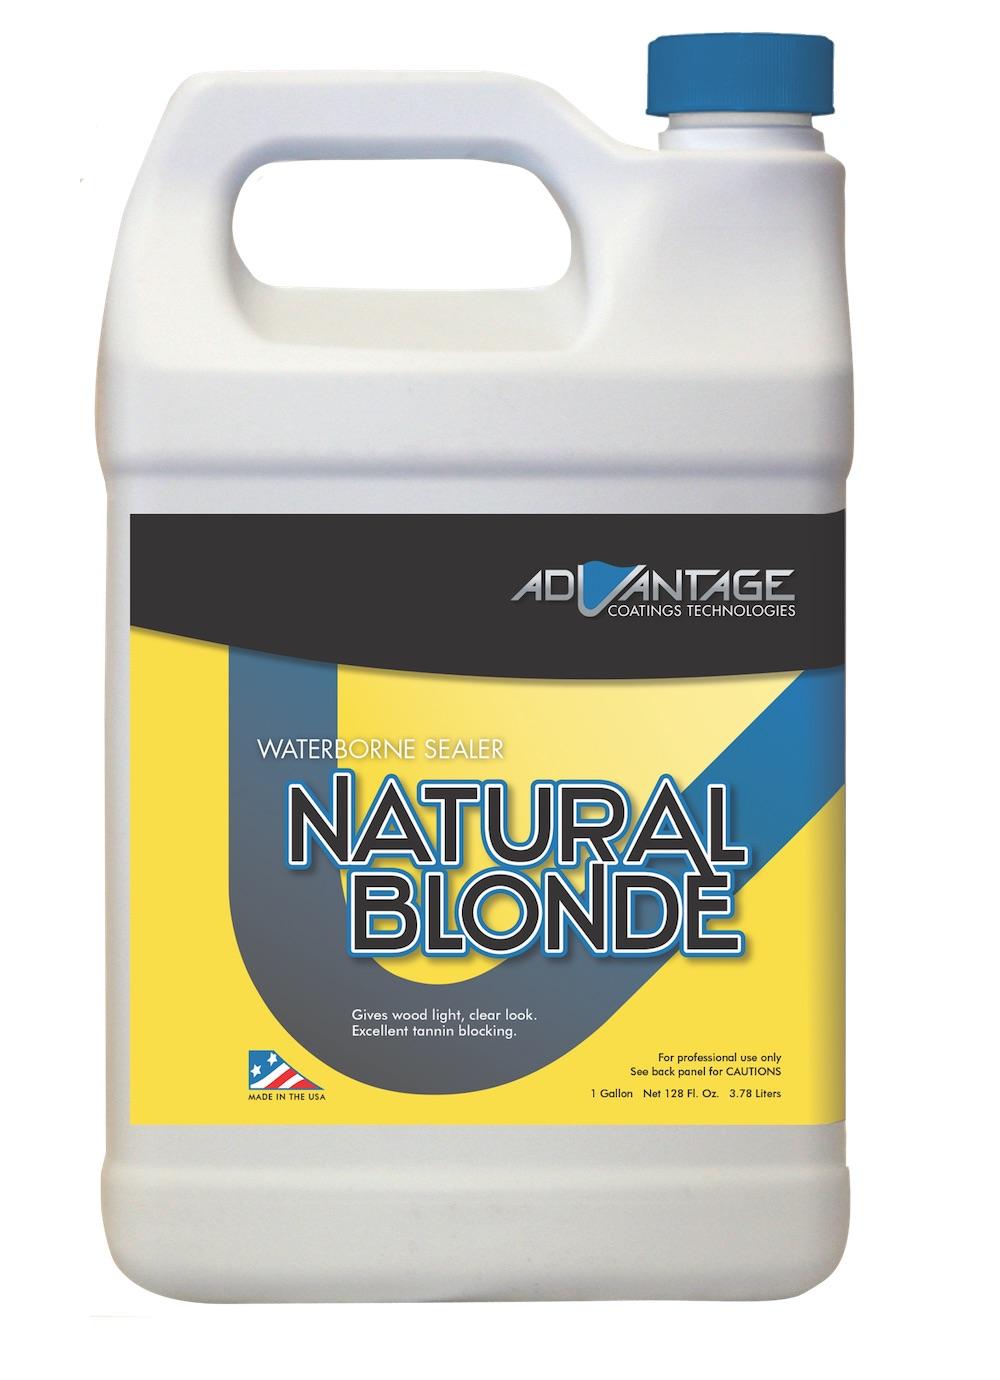 Natural Blonde Wood Floor Sealer Advantage Coatings